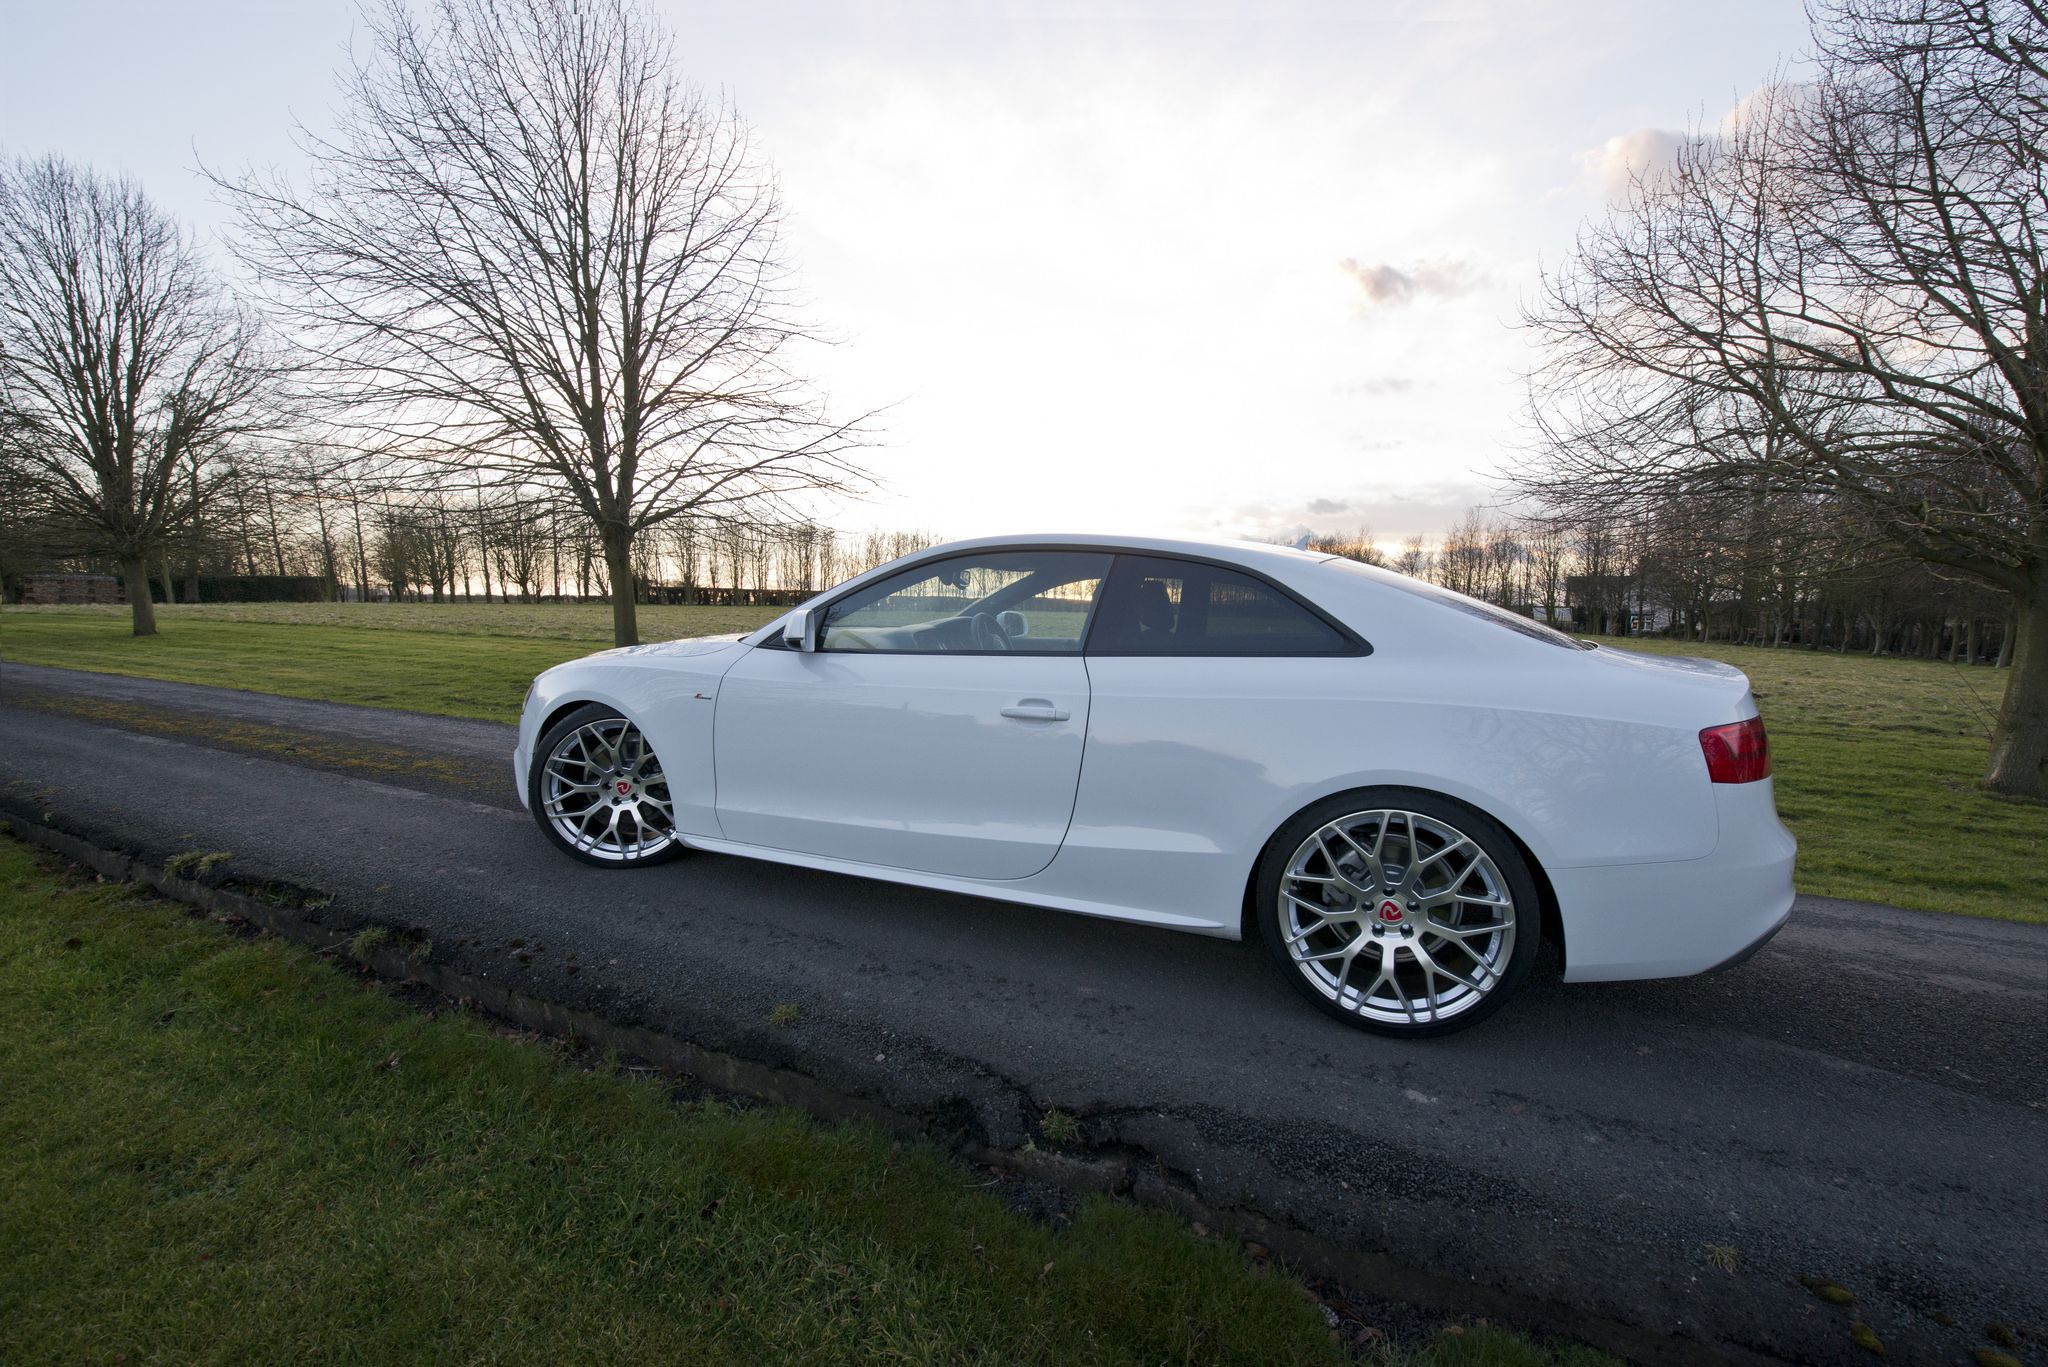 Audi A5 Sportback 2013 Matt Grau Best Books Resources S Line Coupe On 20 Silver Alloy Wheels